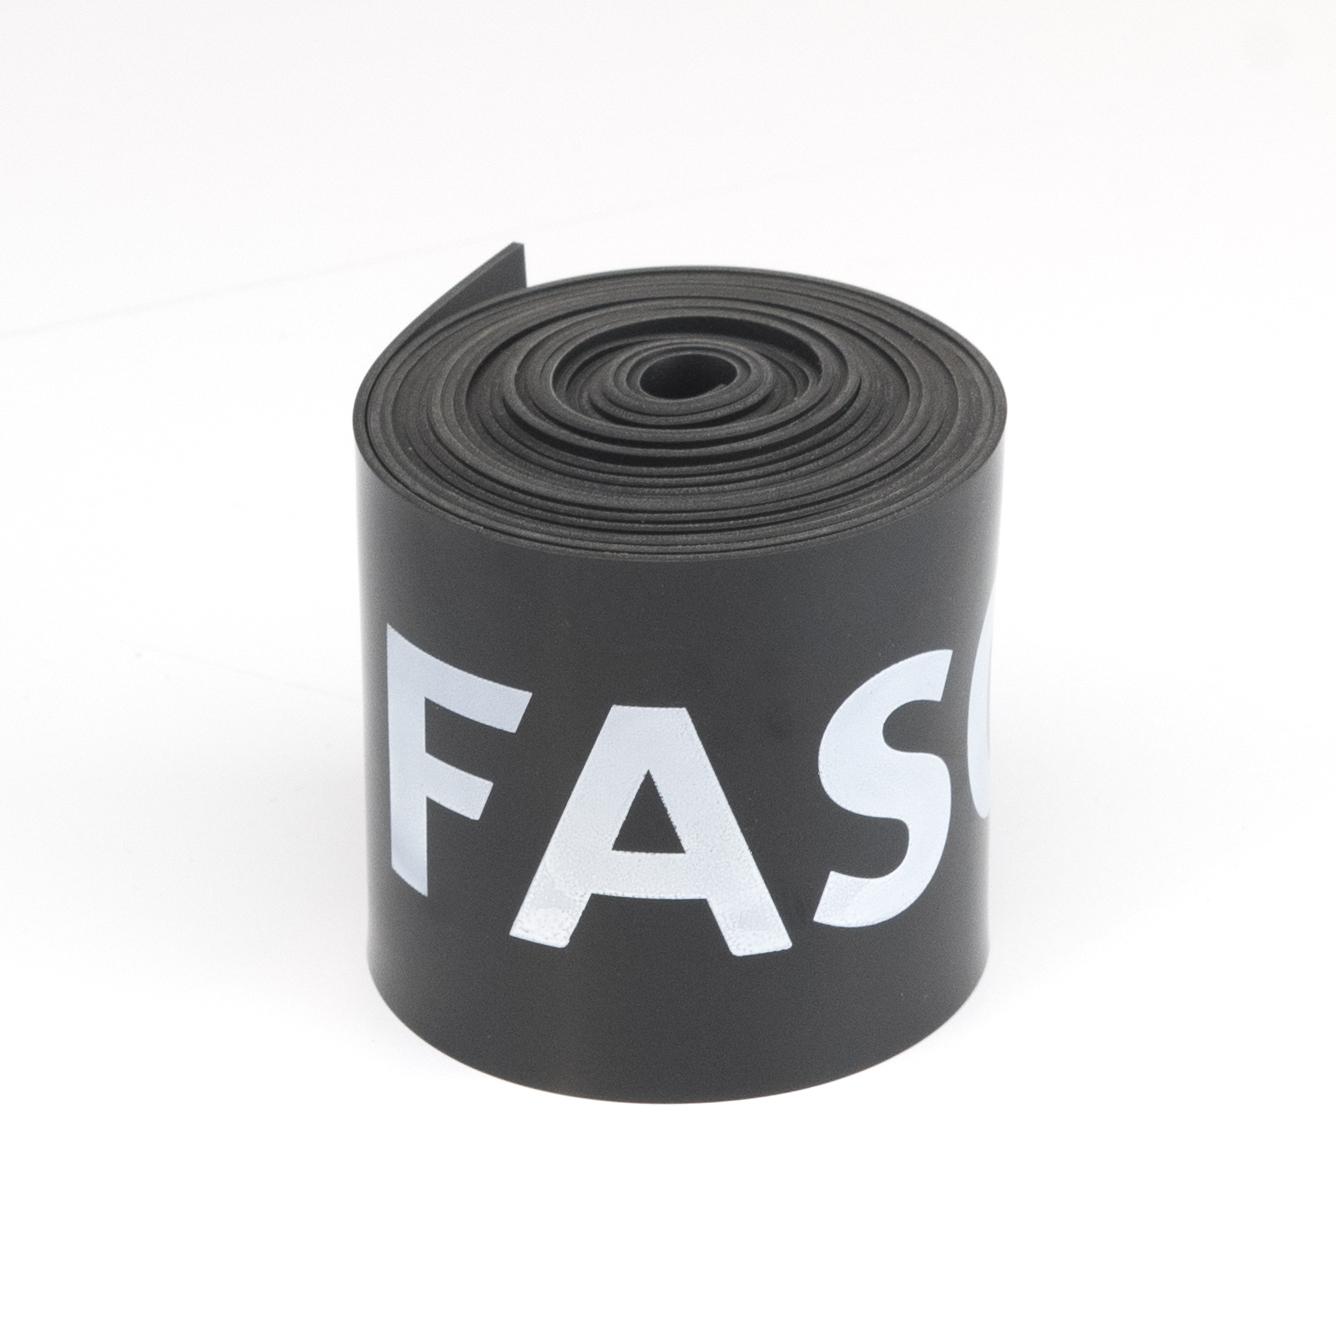 fasciq-flossband-5-cm-1-mm